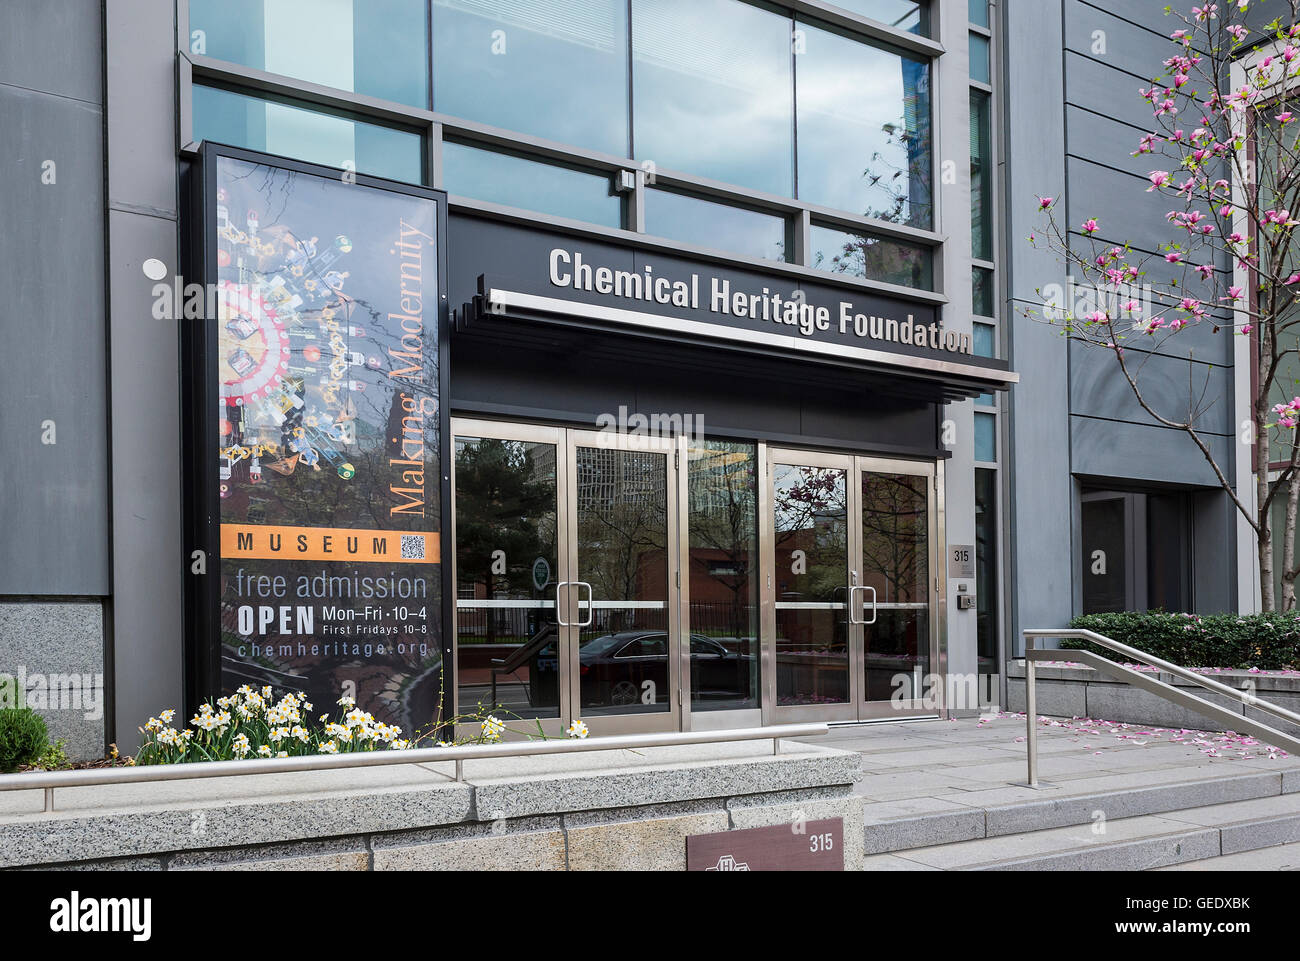 Chemical Heritage Foundation, Philadelphia, Pennsylvania, USA - Stock Image